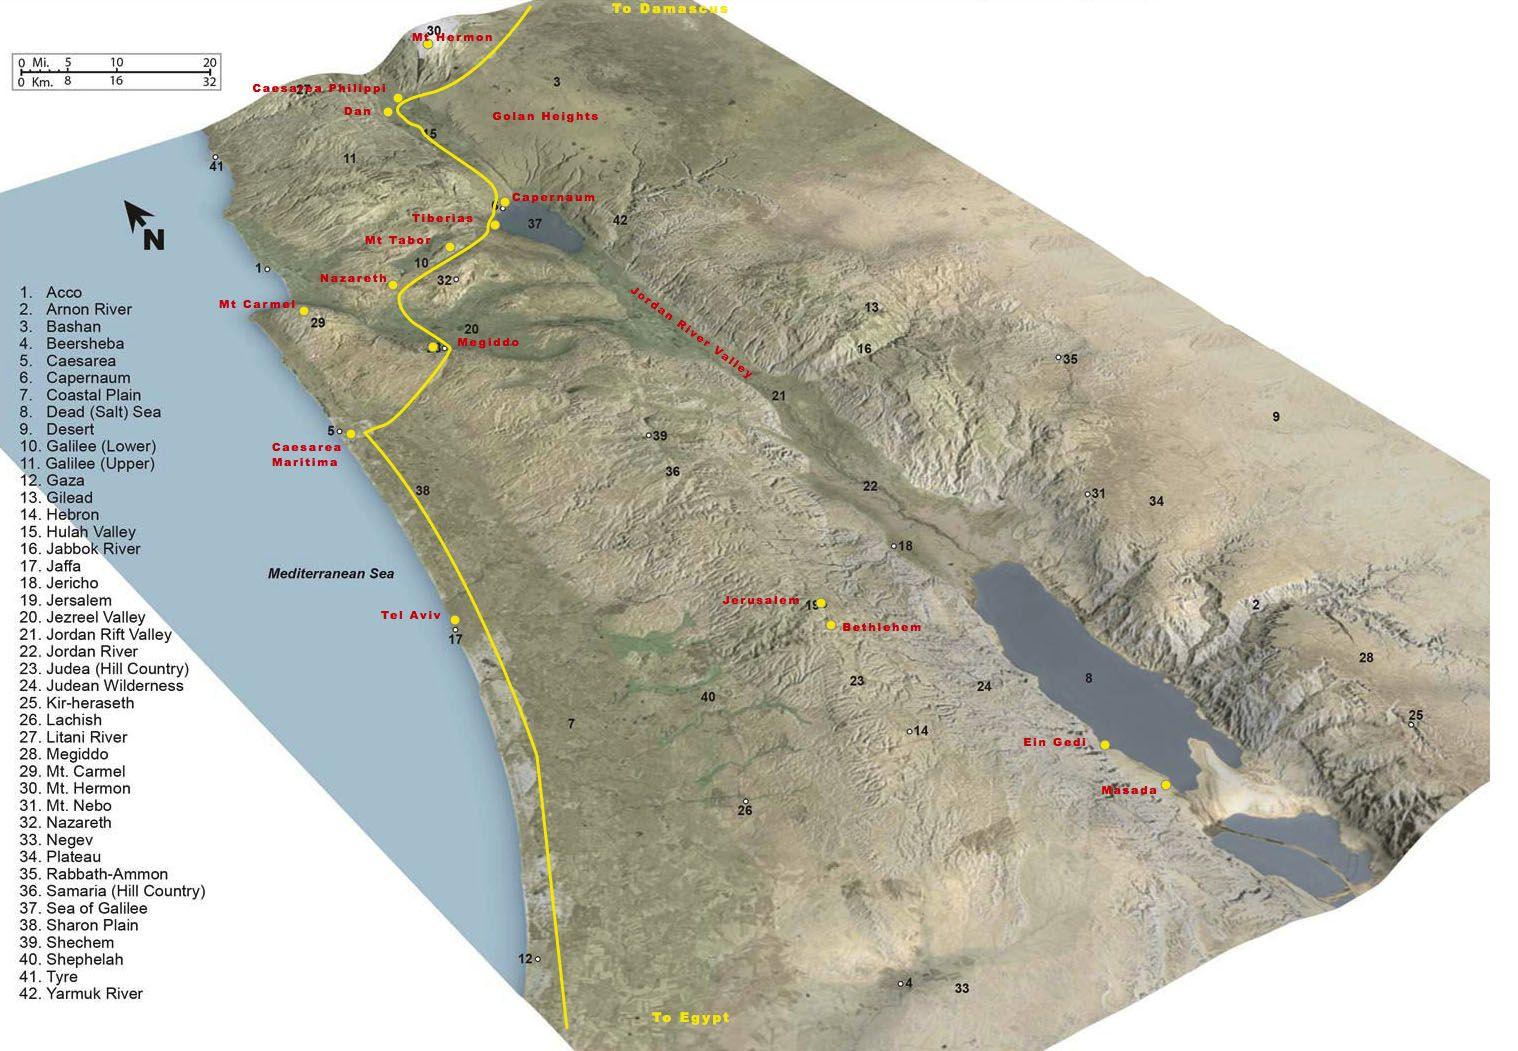 Israel Topograhpic Map Israel 1st Century Pinterest Israel